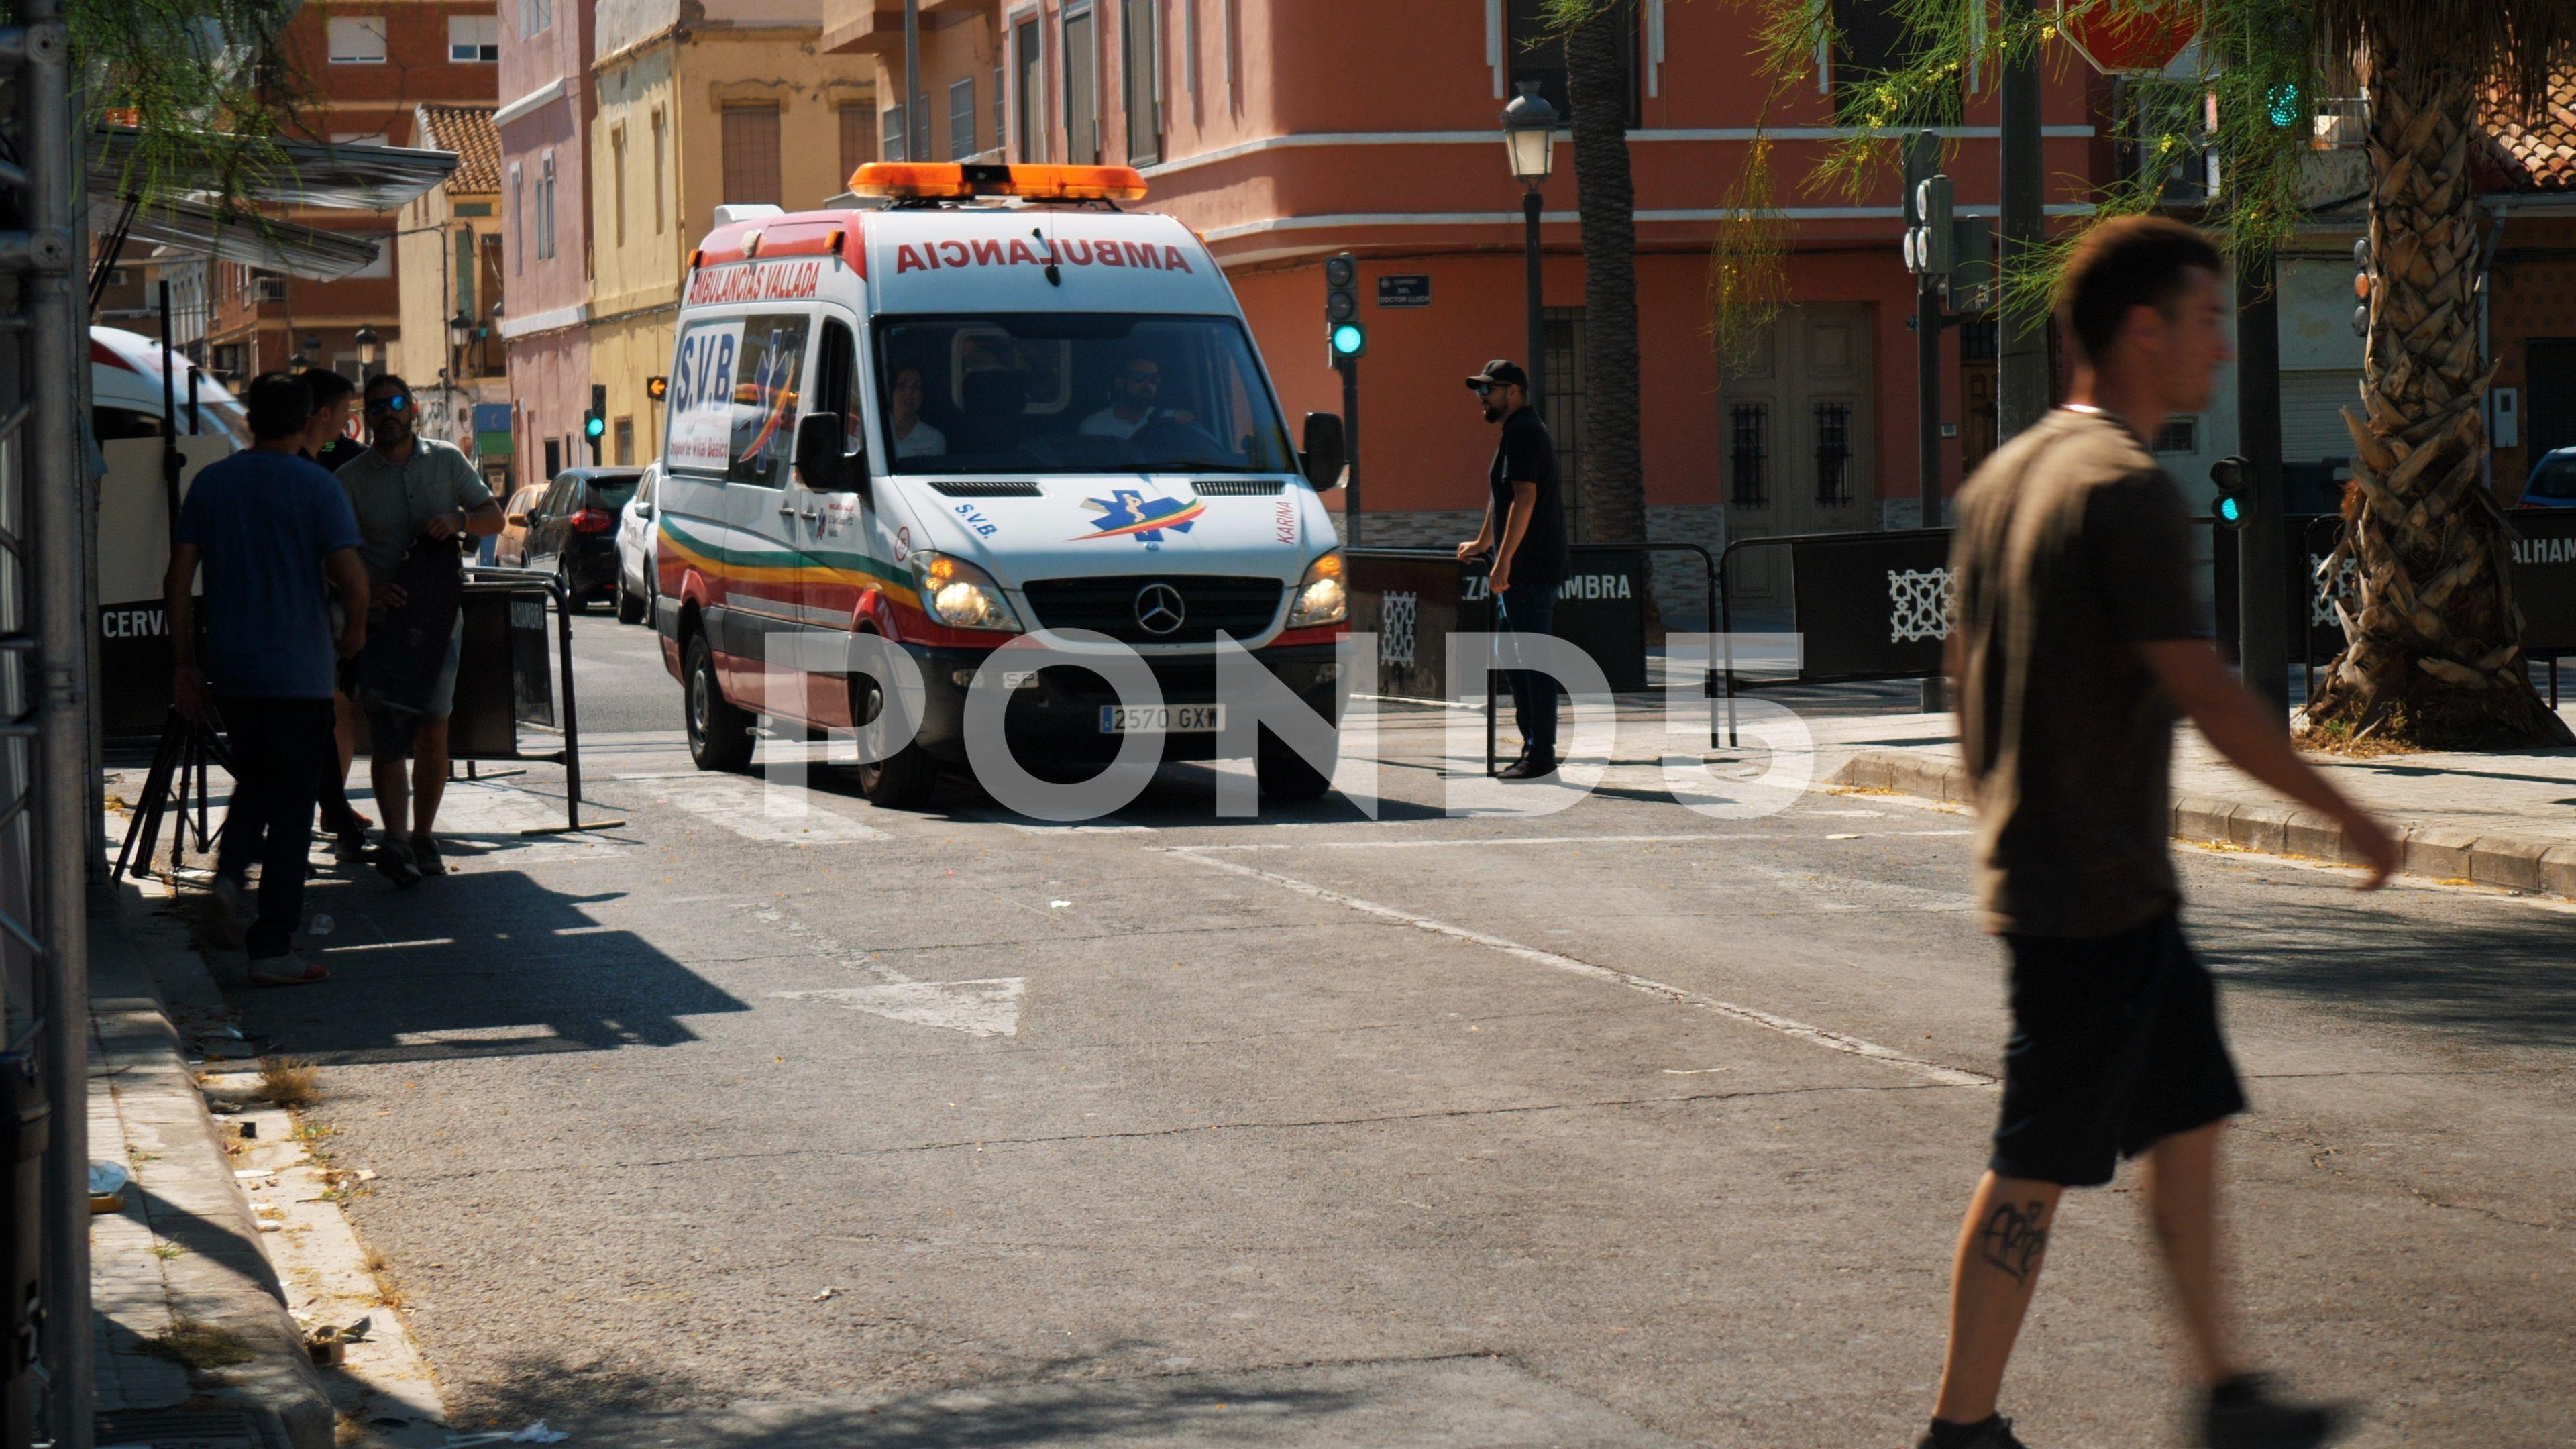 Ambulances arriving at event venue to provide medical